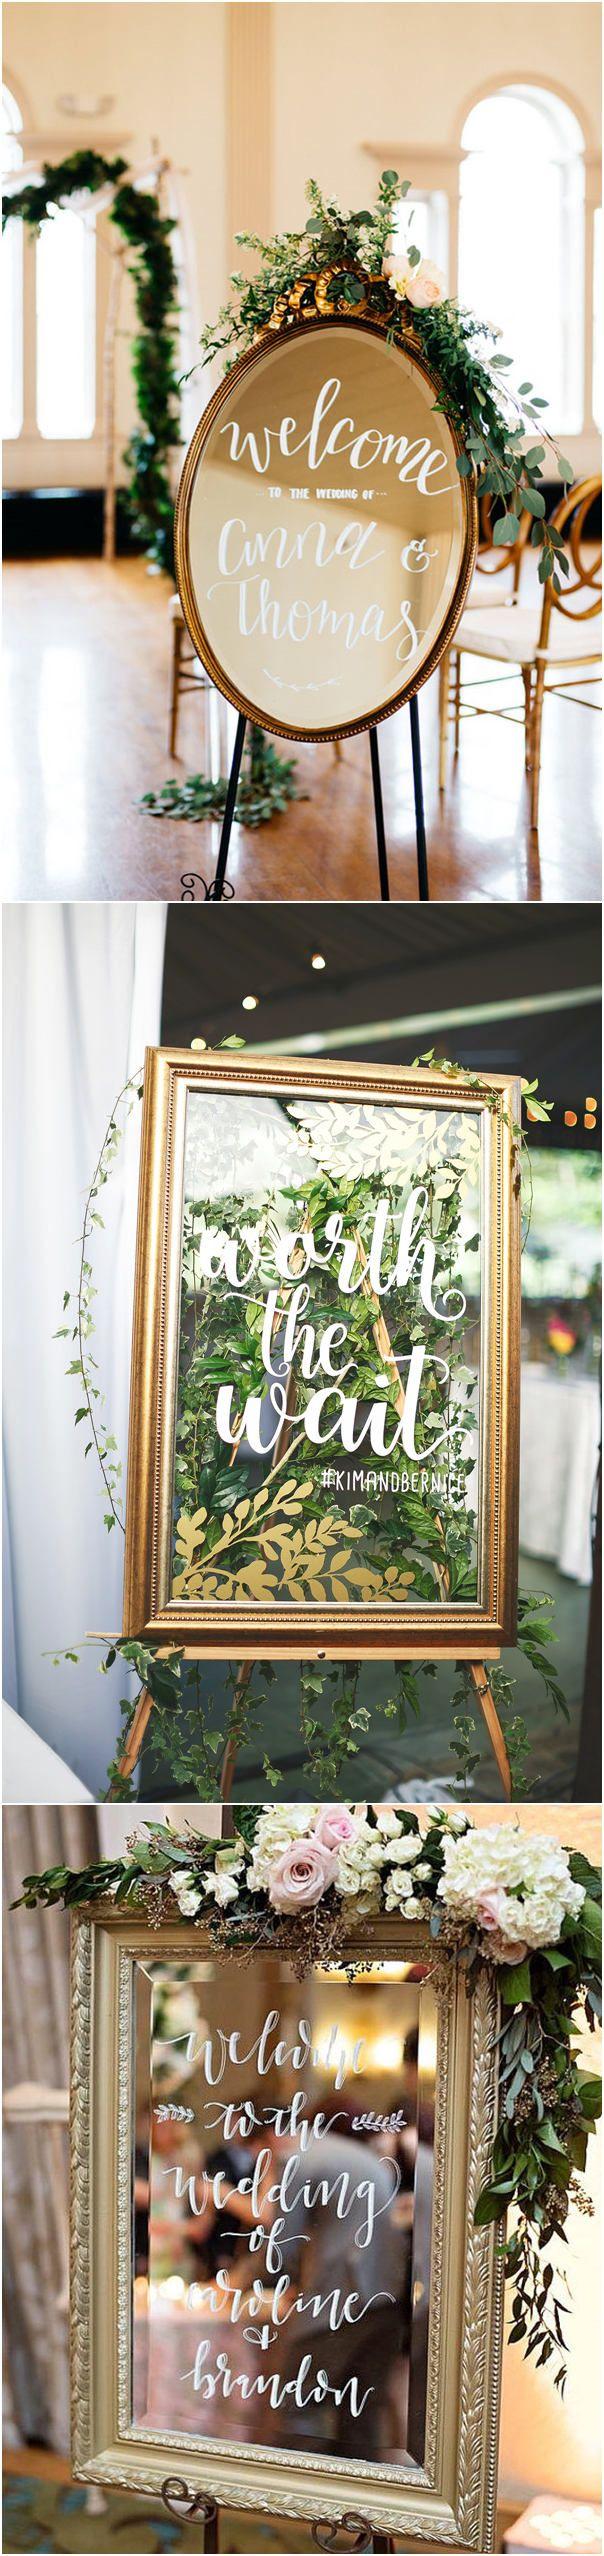 Vintage Wedding Ideas With Mirror Wedding Welcome Sign Ideas Wedding Signs Wedding Welcome Signs Vintage Wedding Signs